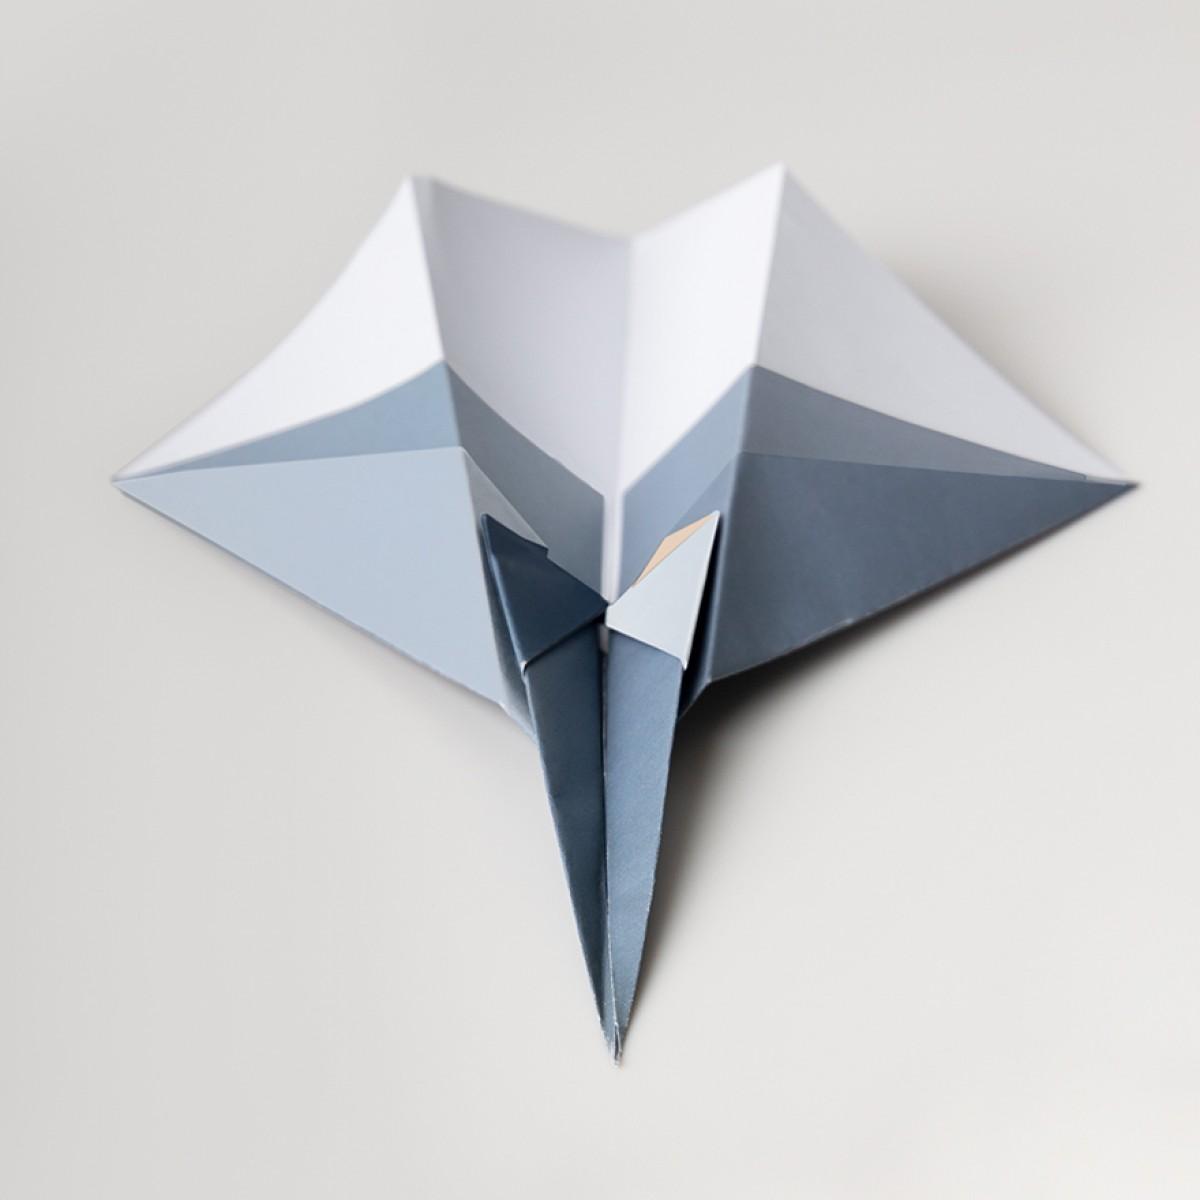 Origami Poster Papierdüsenflieger, mehrfarbig, von Christina Pauls